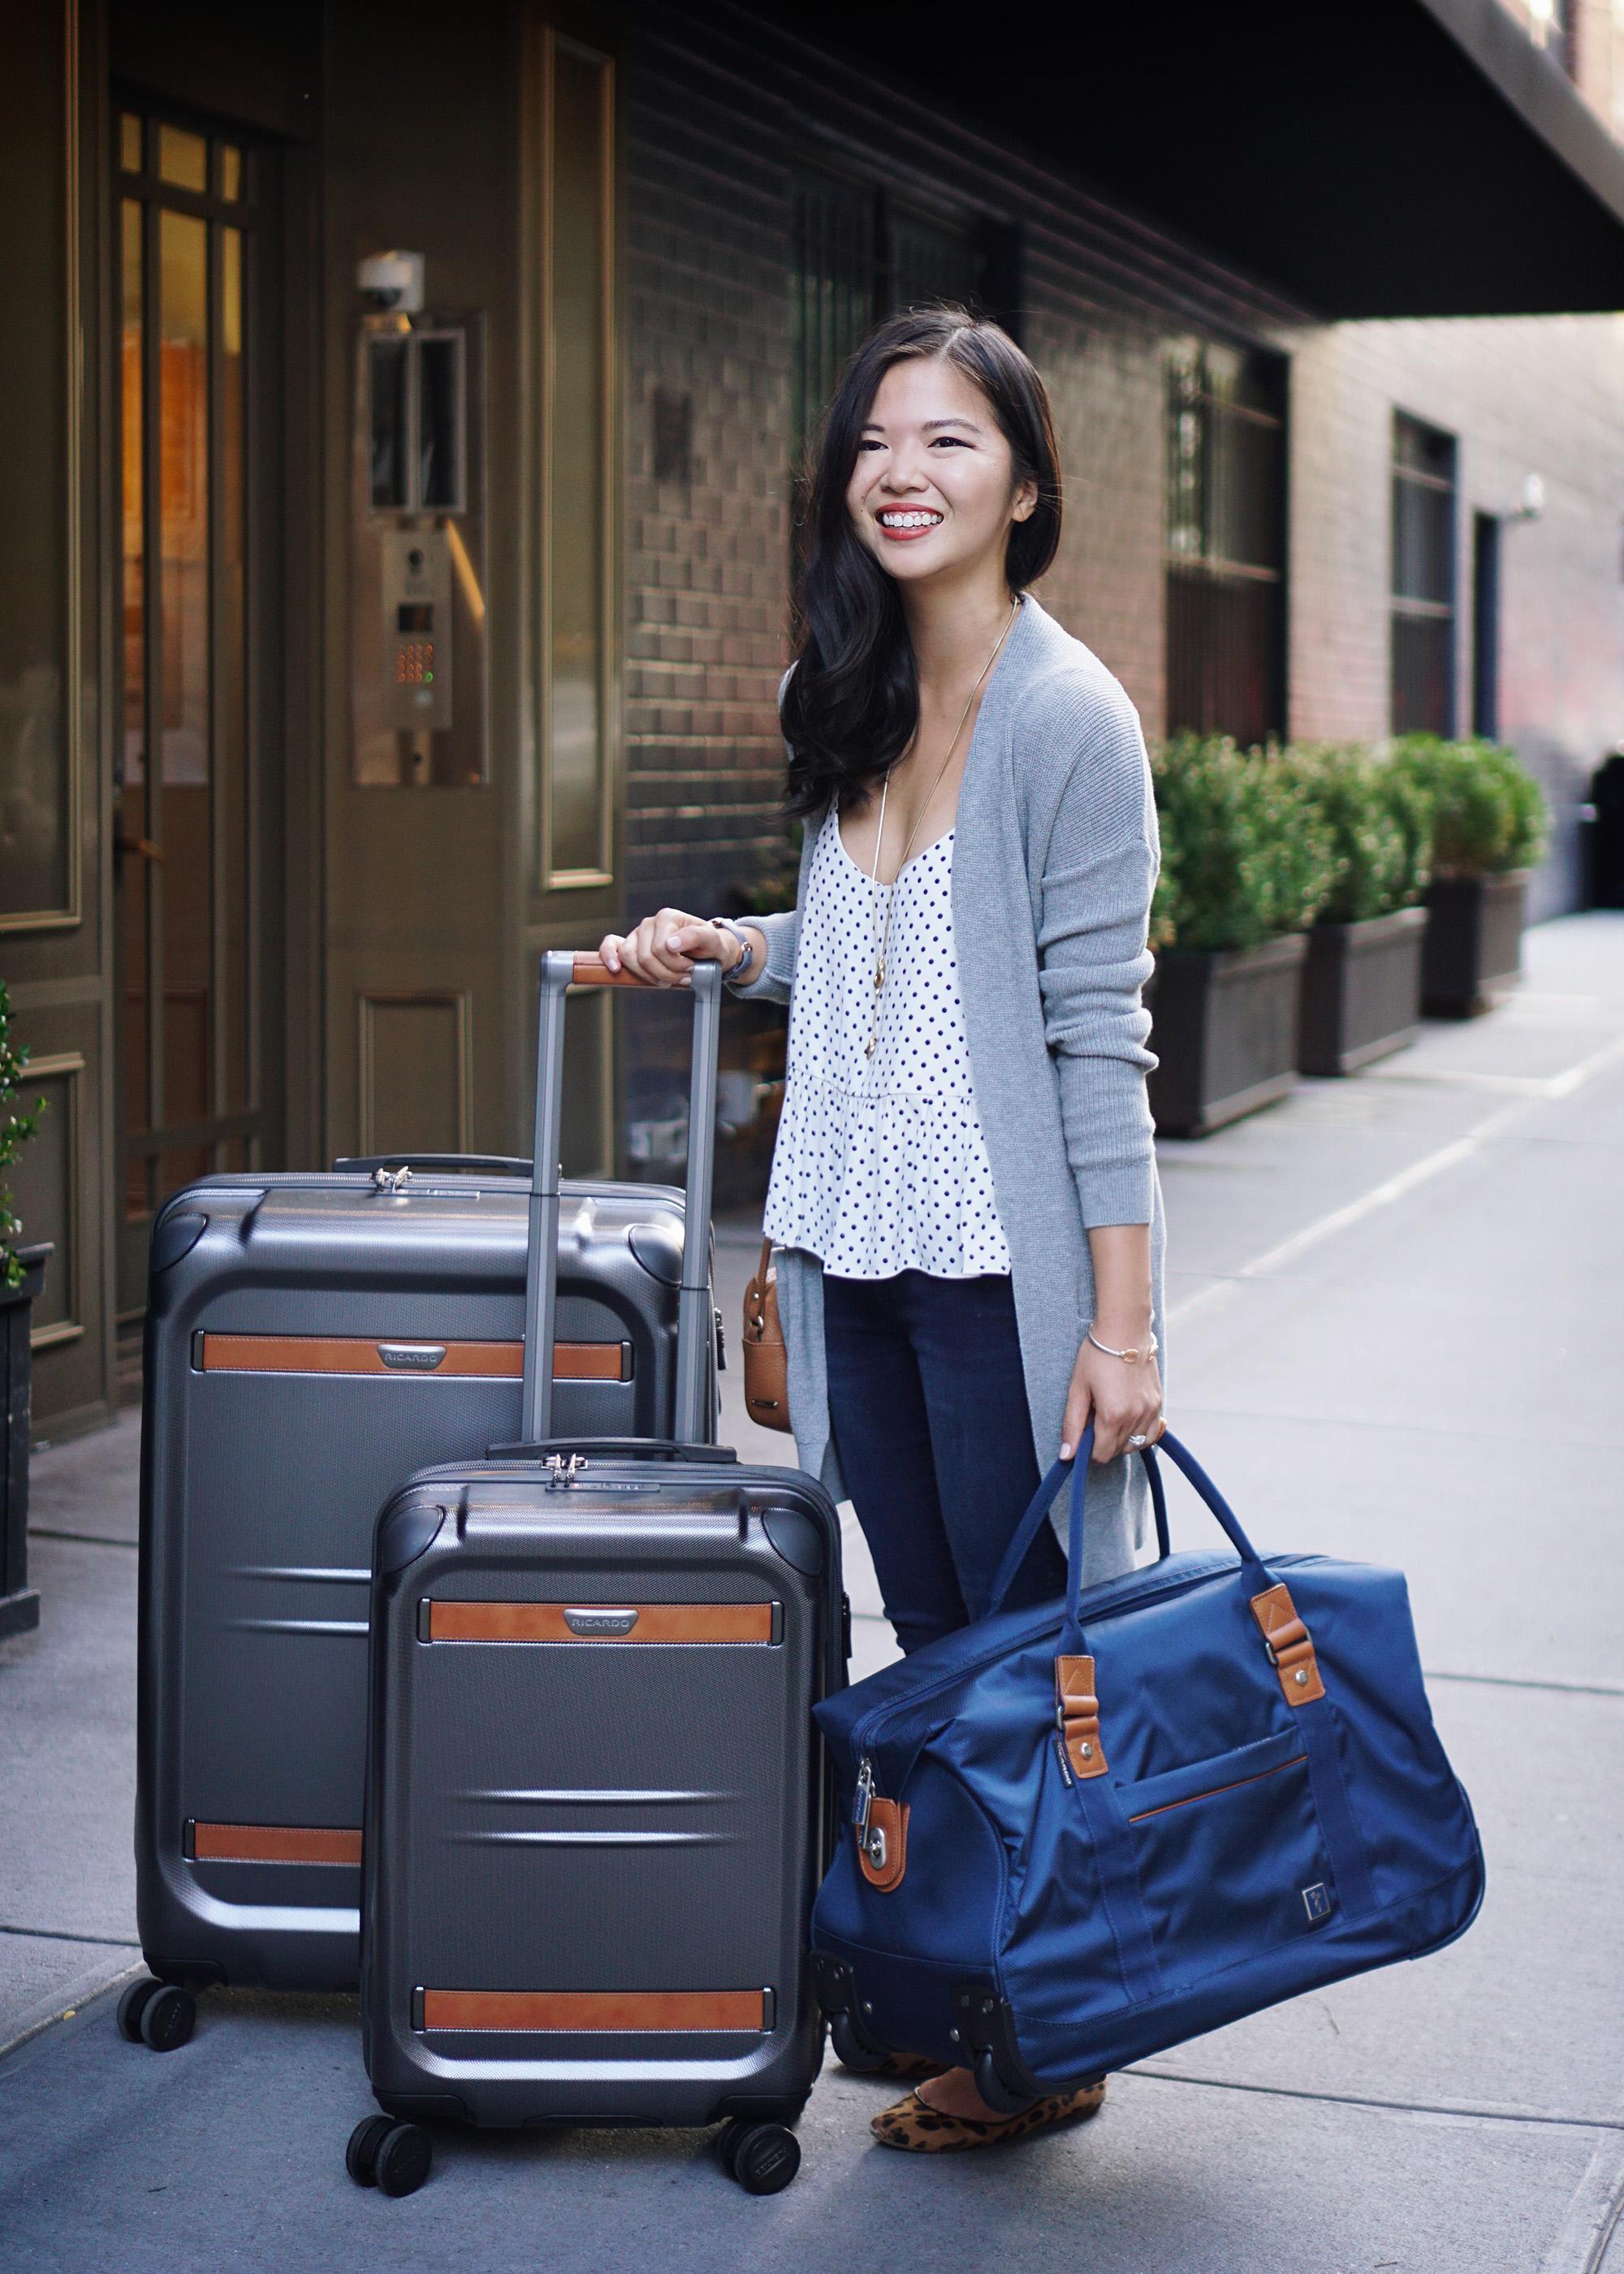 Travel Outfit Inspiration & Affordable Hardcase Luggage